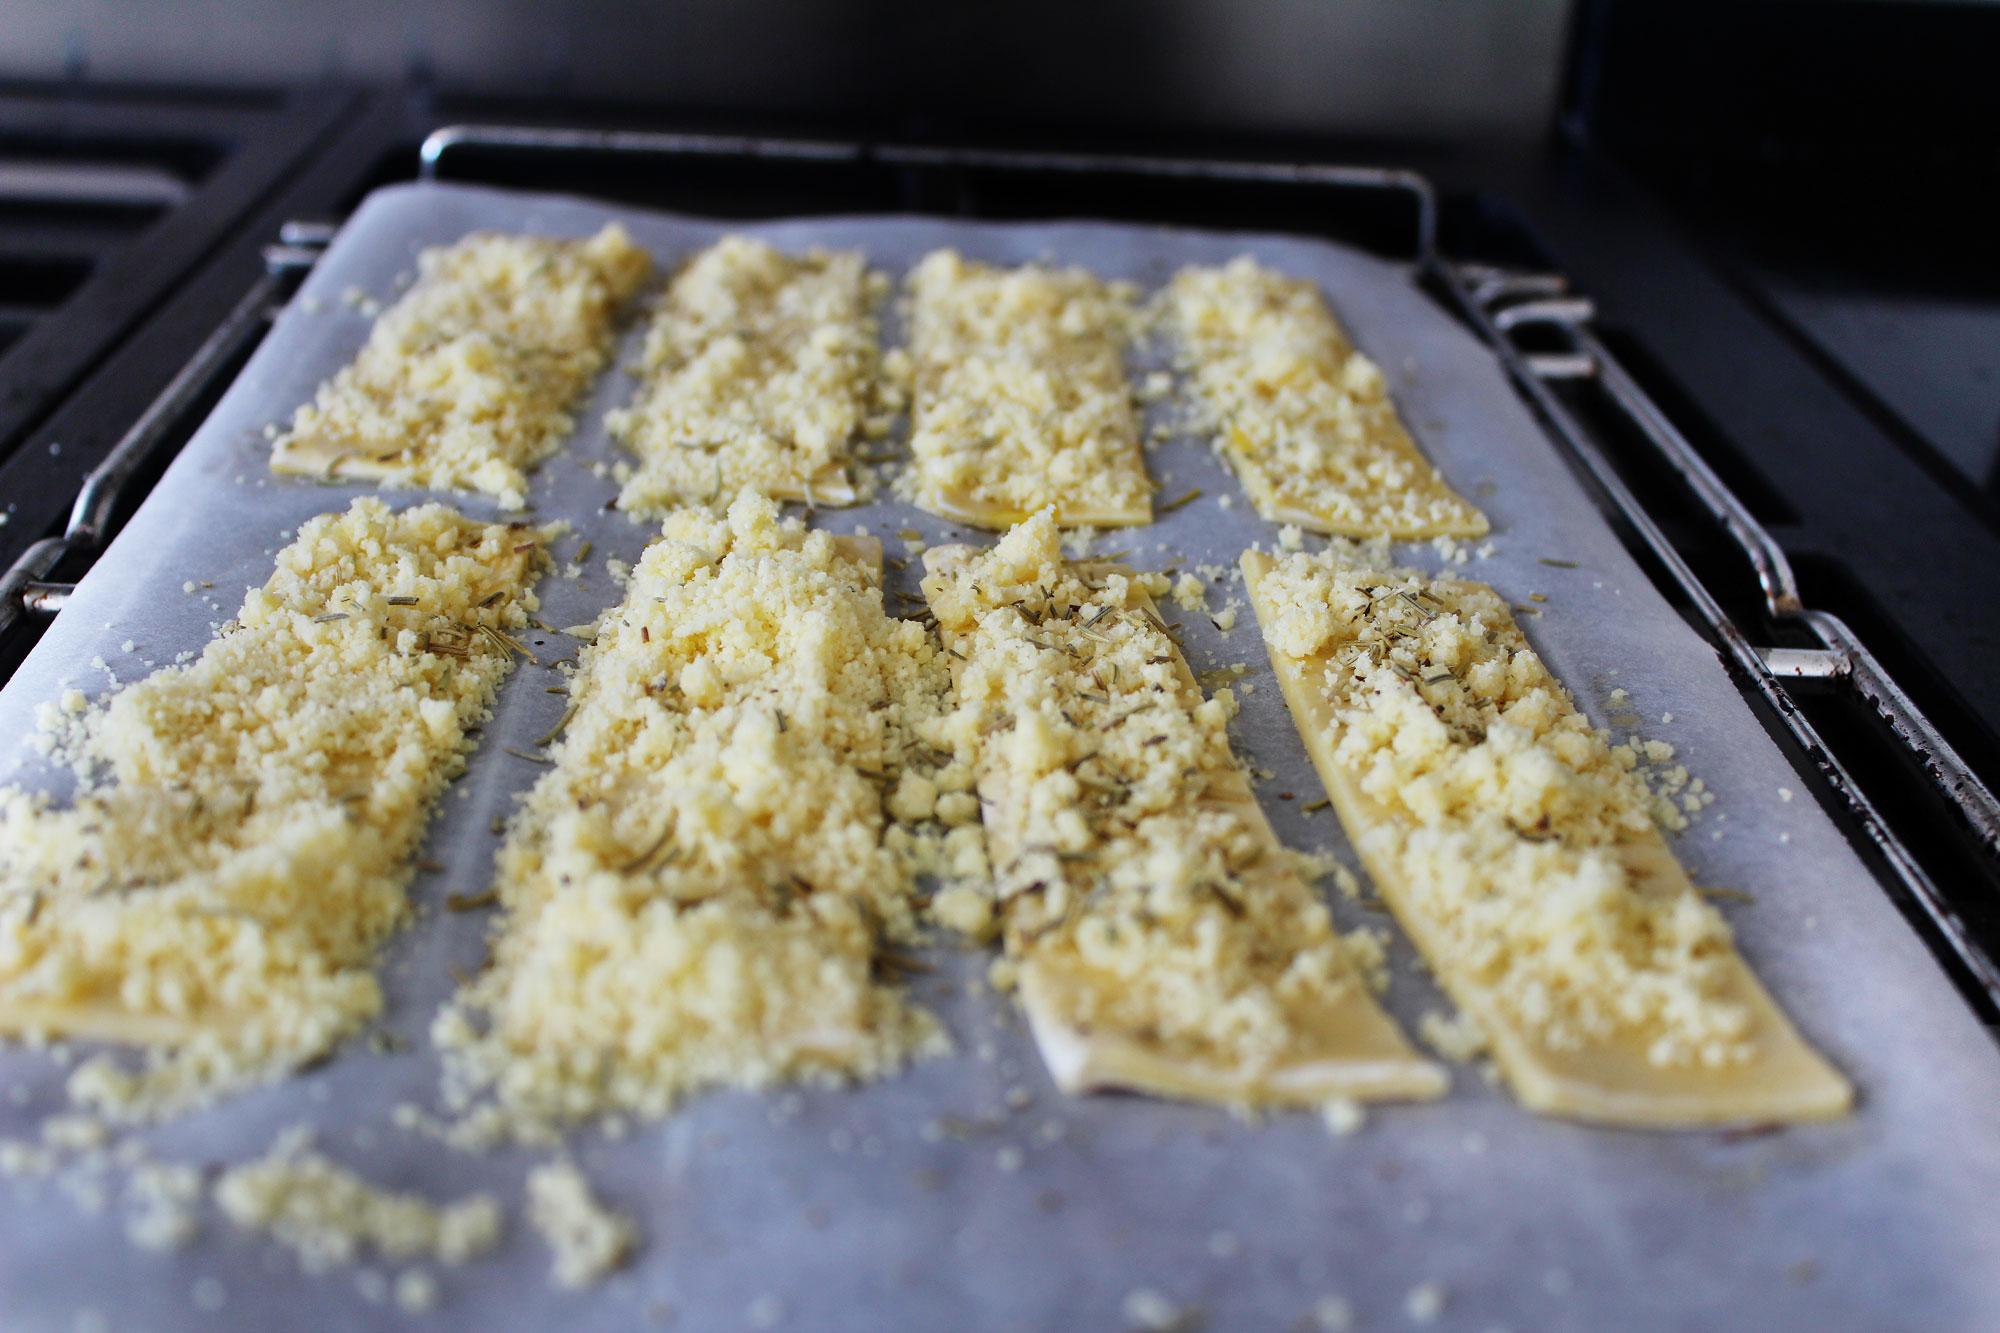 Bladerdeeg met ei, parmzaanse kaas en rozemarijn